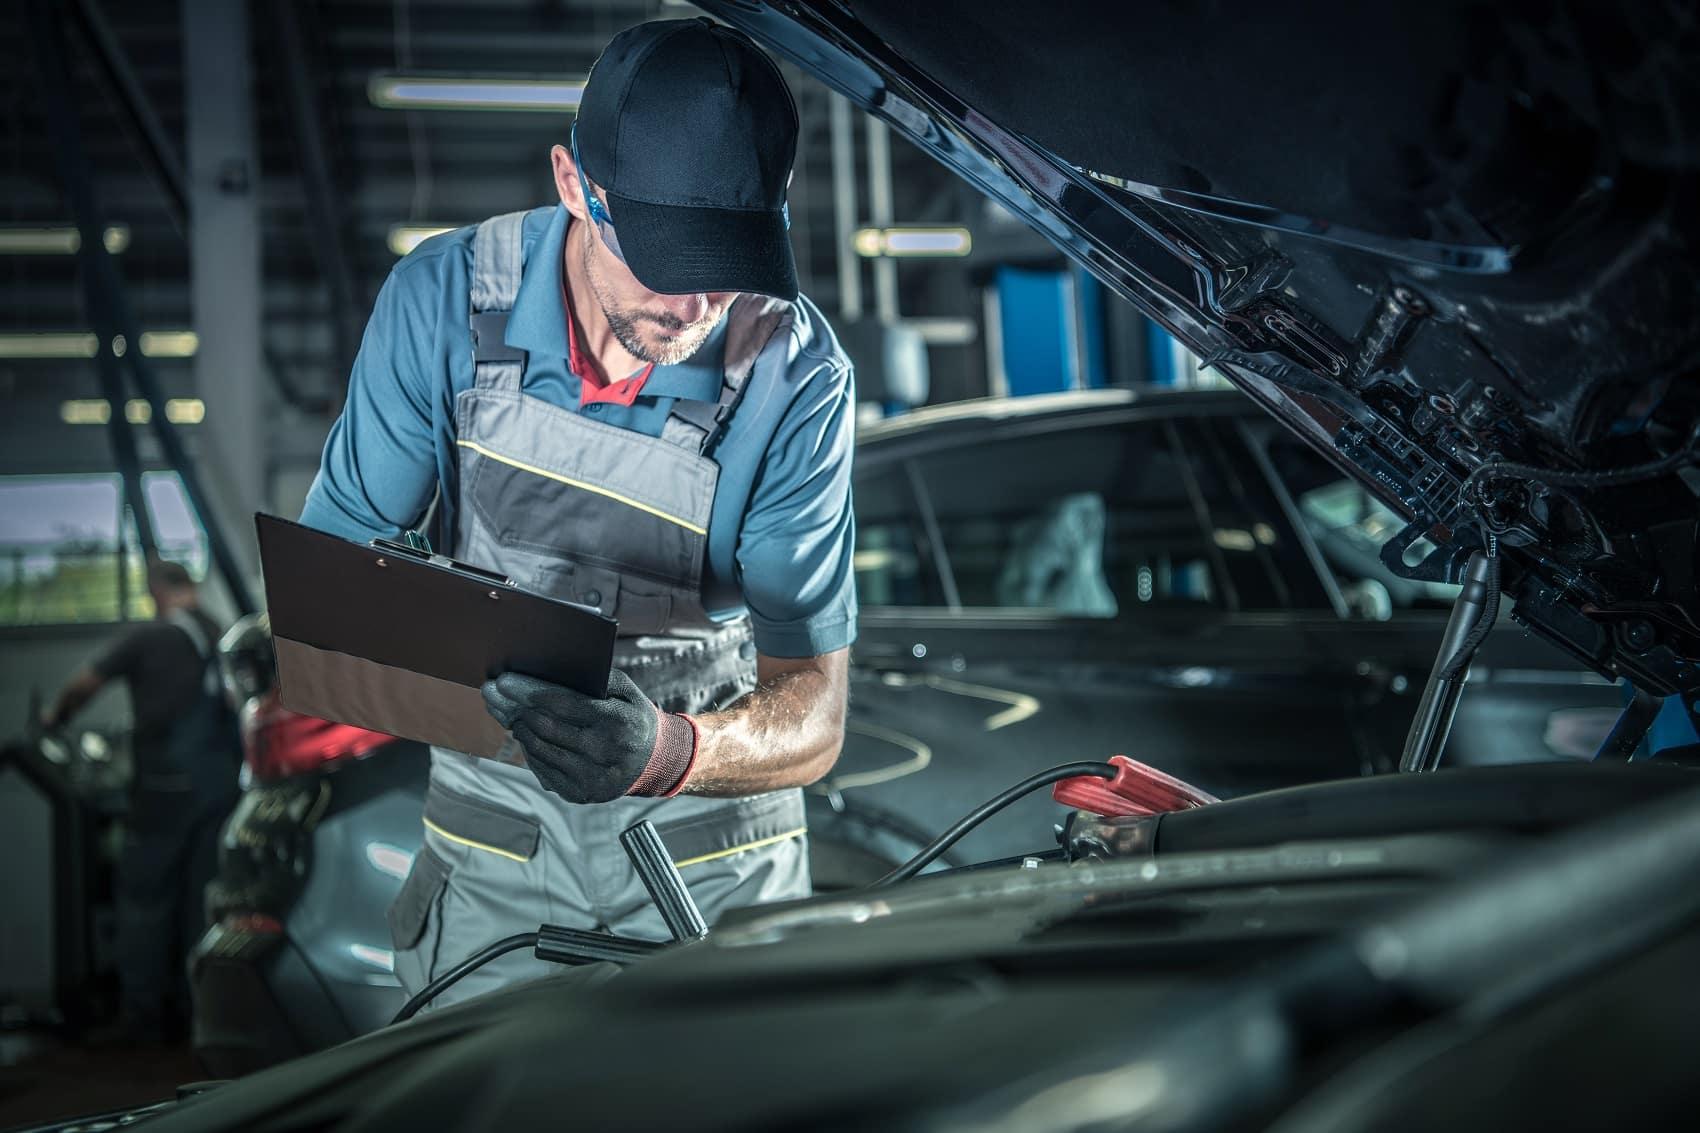 Mechanic under the hood